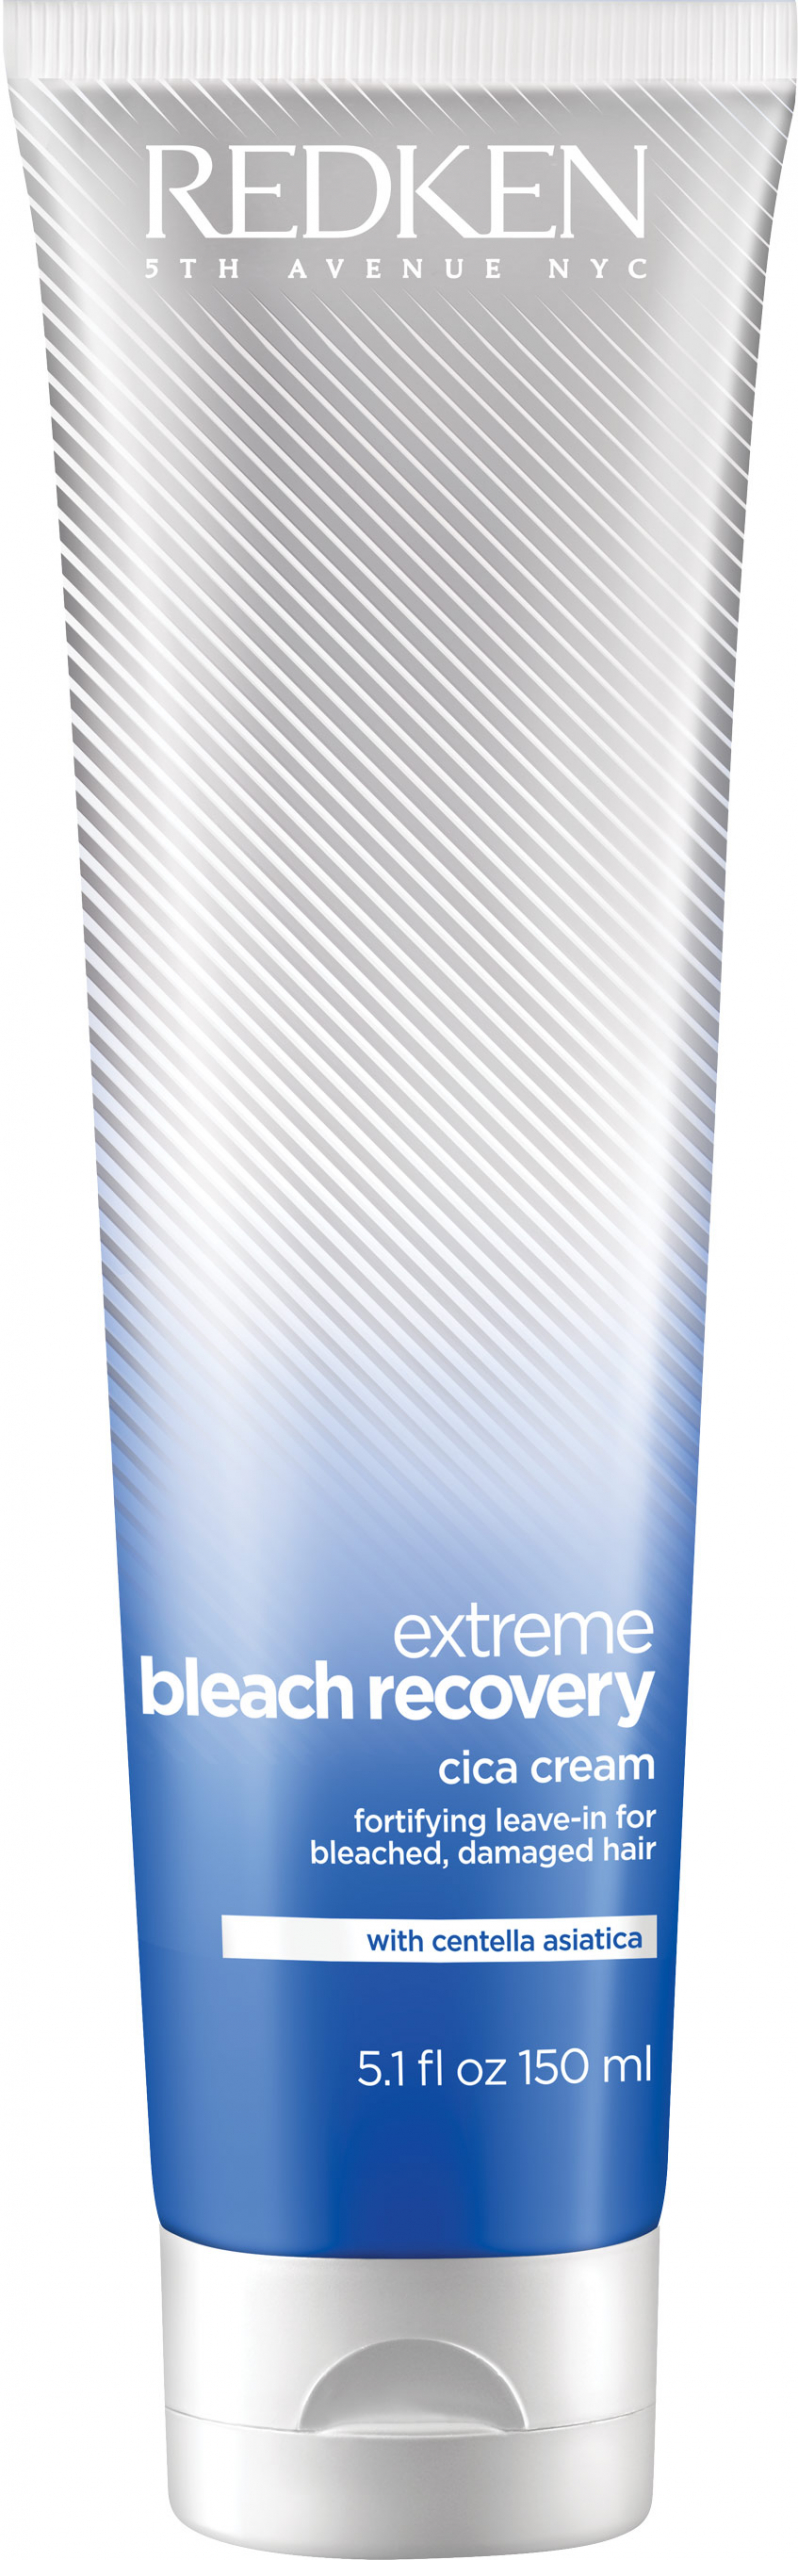 крем Extreme Bleach Recovery redken